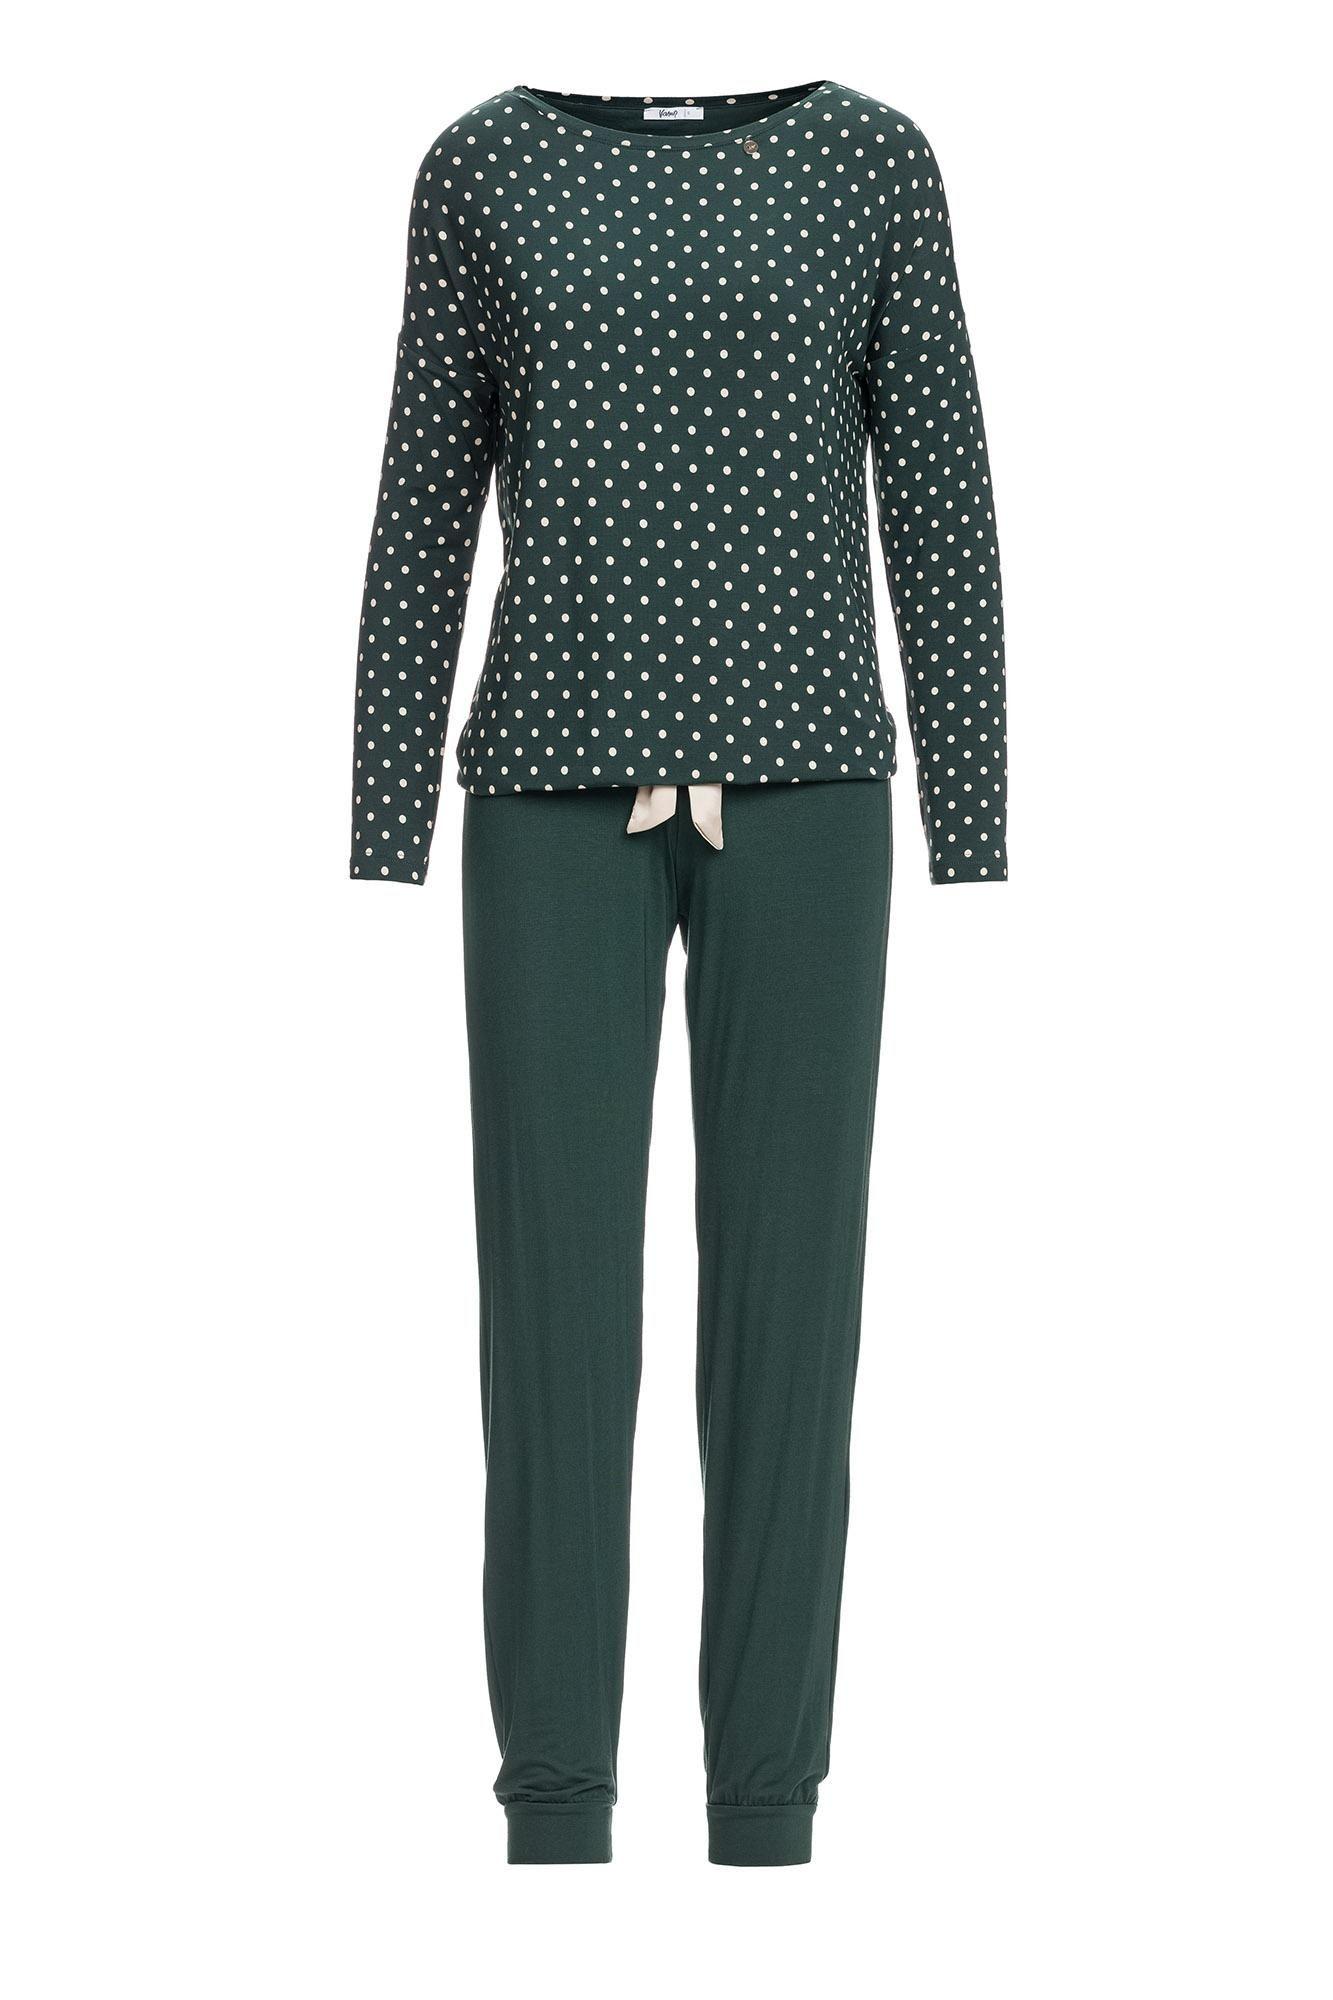 Women's Polka Dot Pyjamas